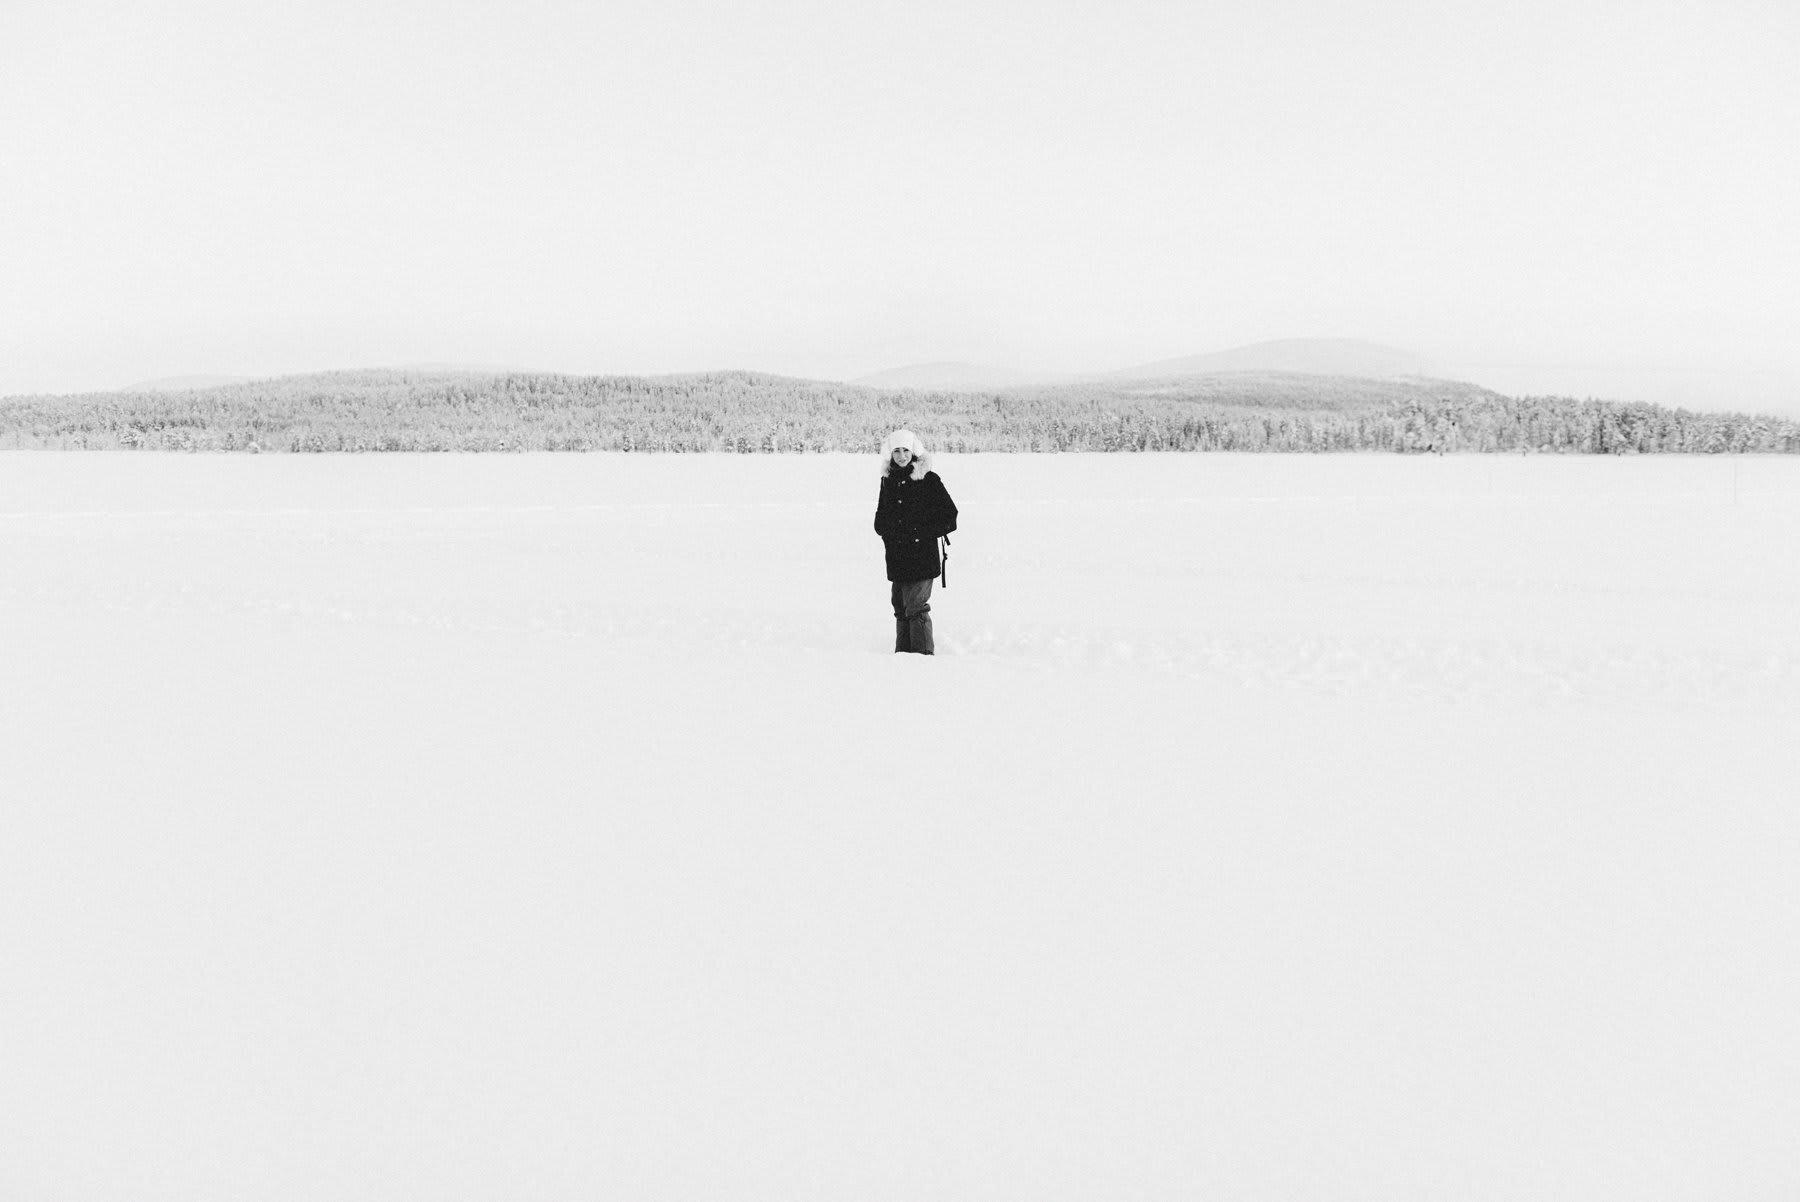 reisefotografie-lappland-finnland-117